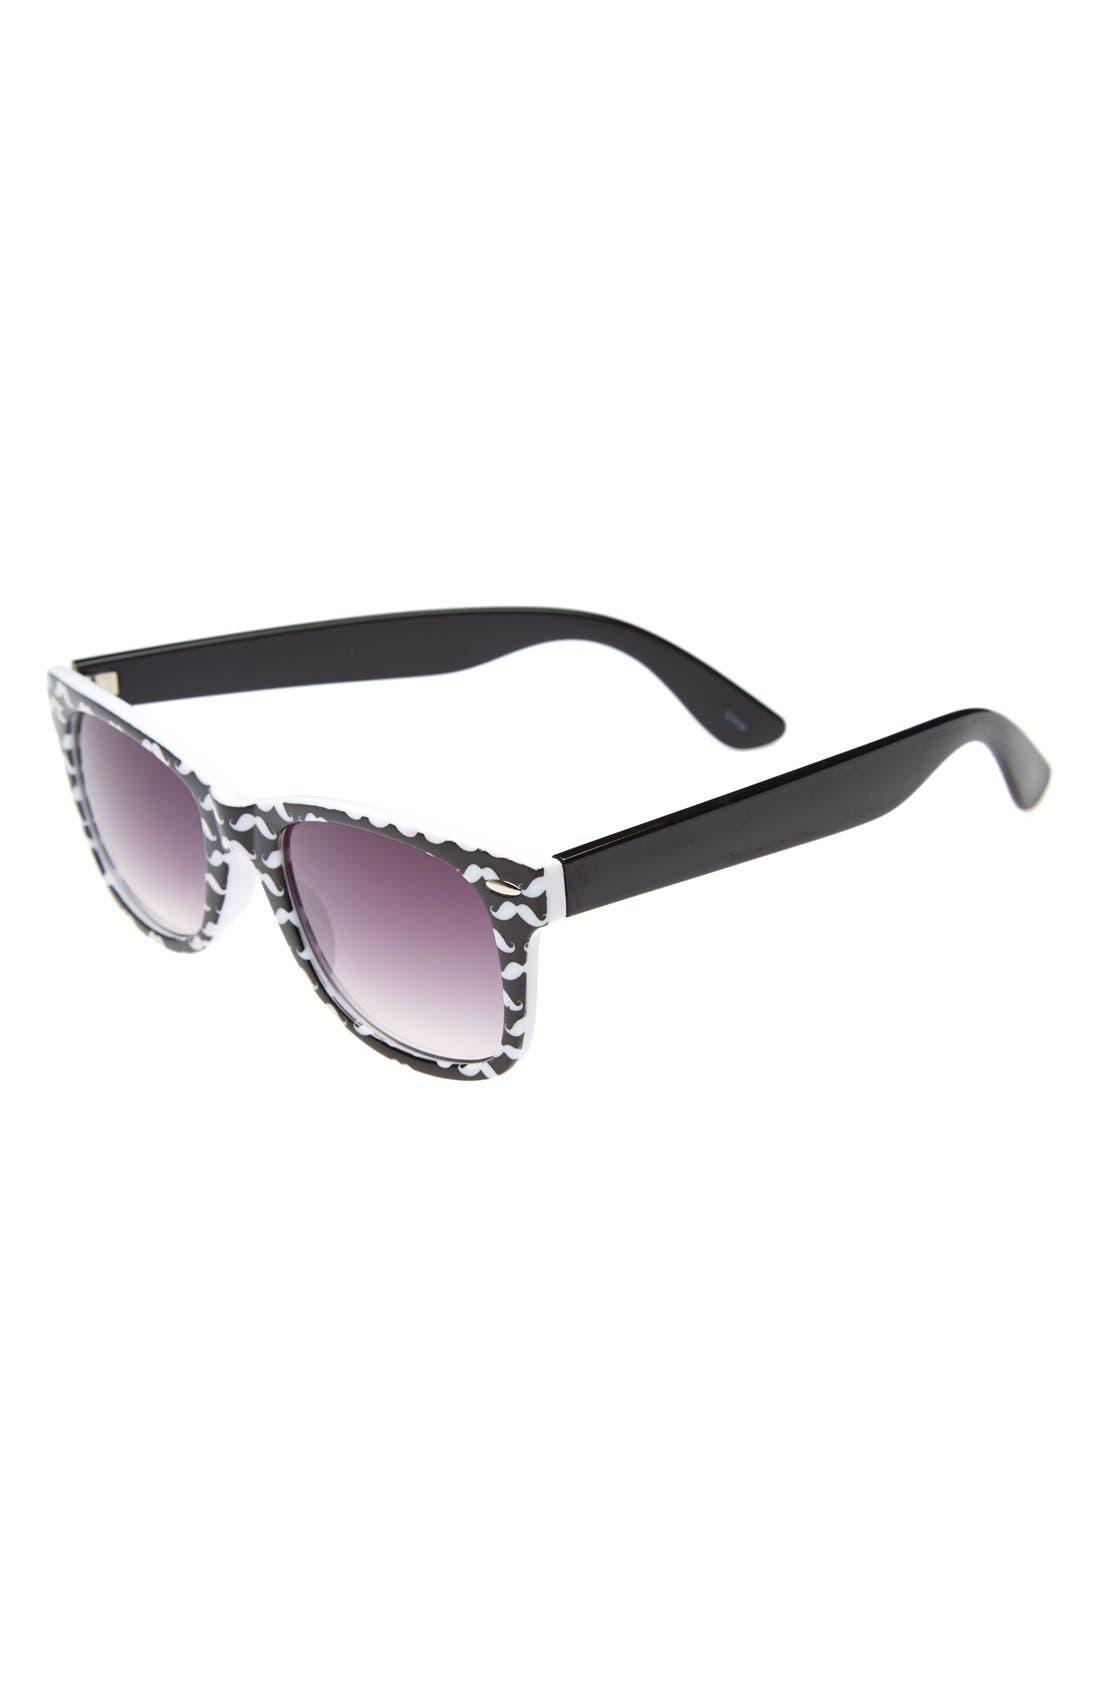 Alternate Image 1 Selected - Icon Eyewear 50mm Retro Sunglasses (Girls)